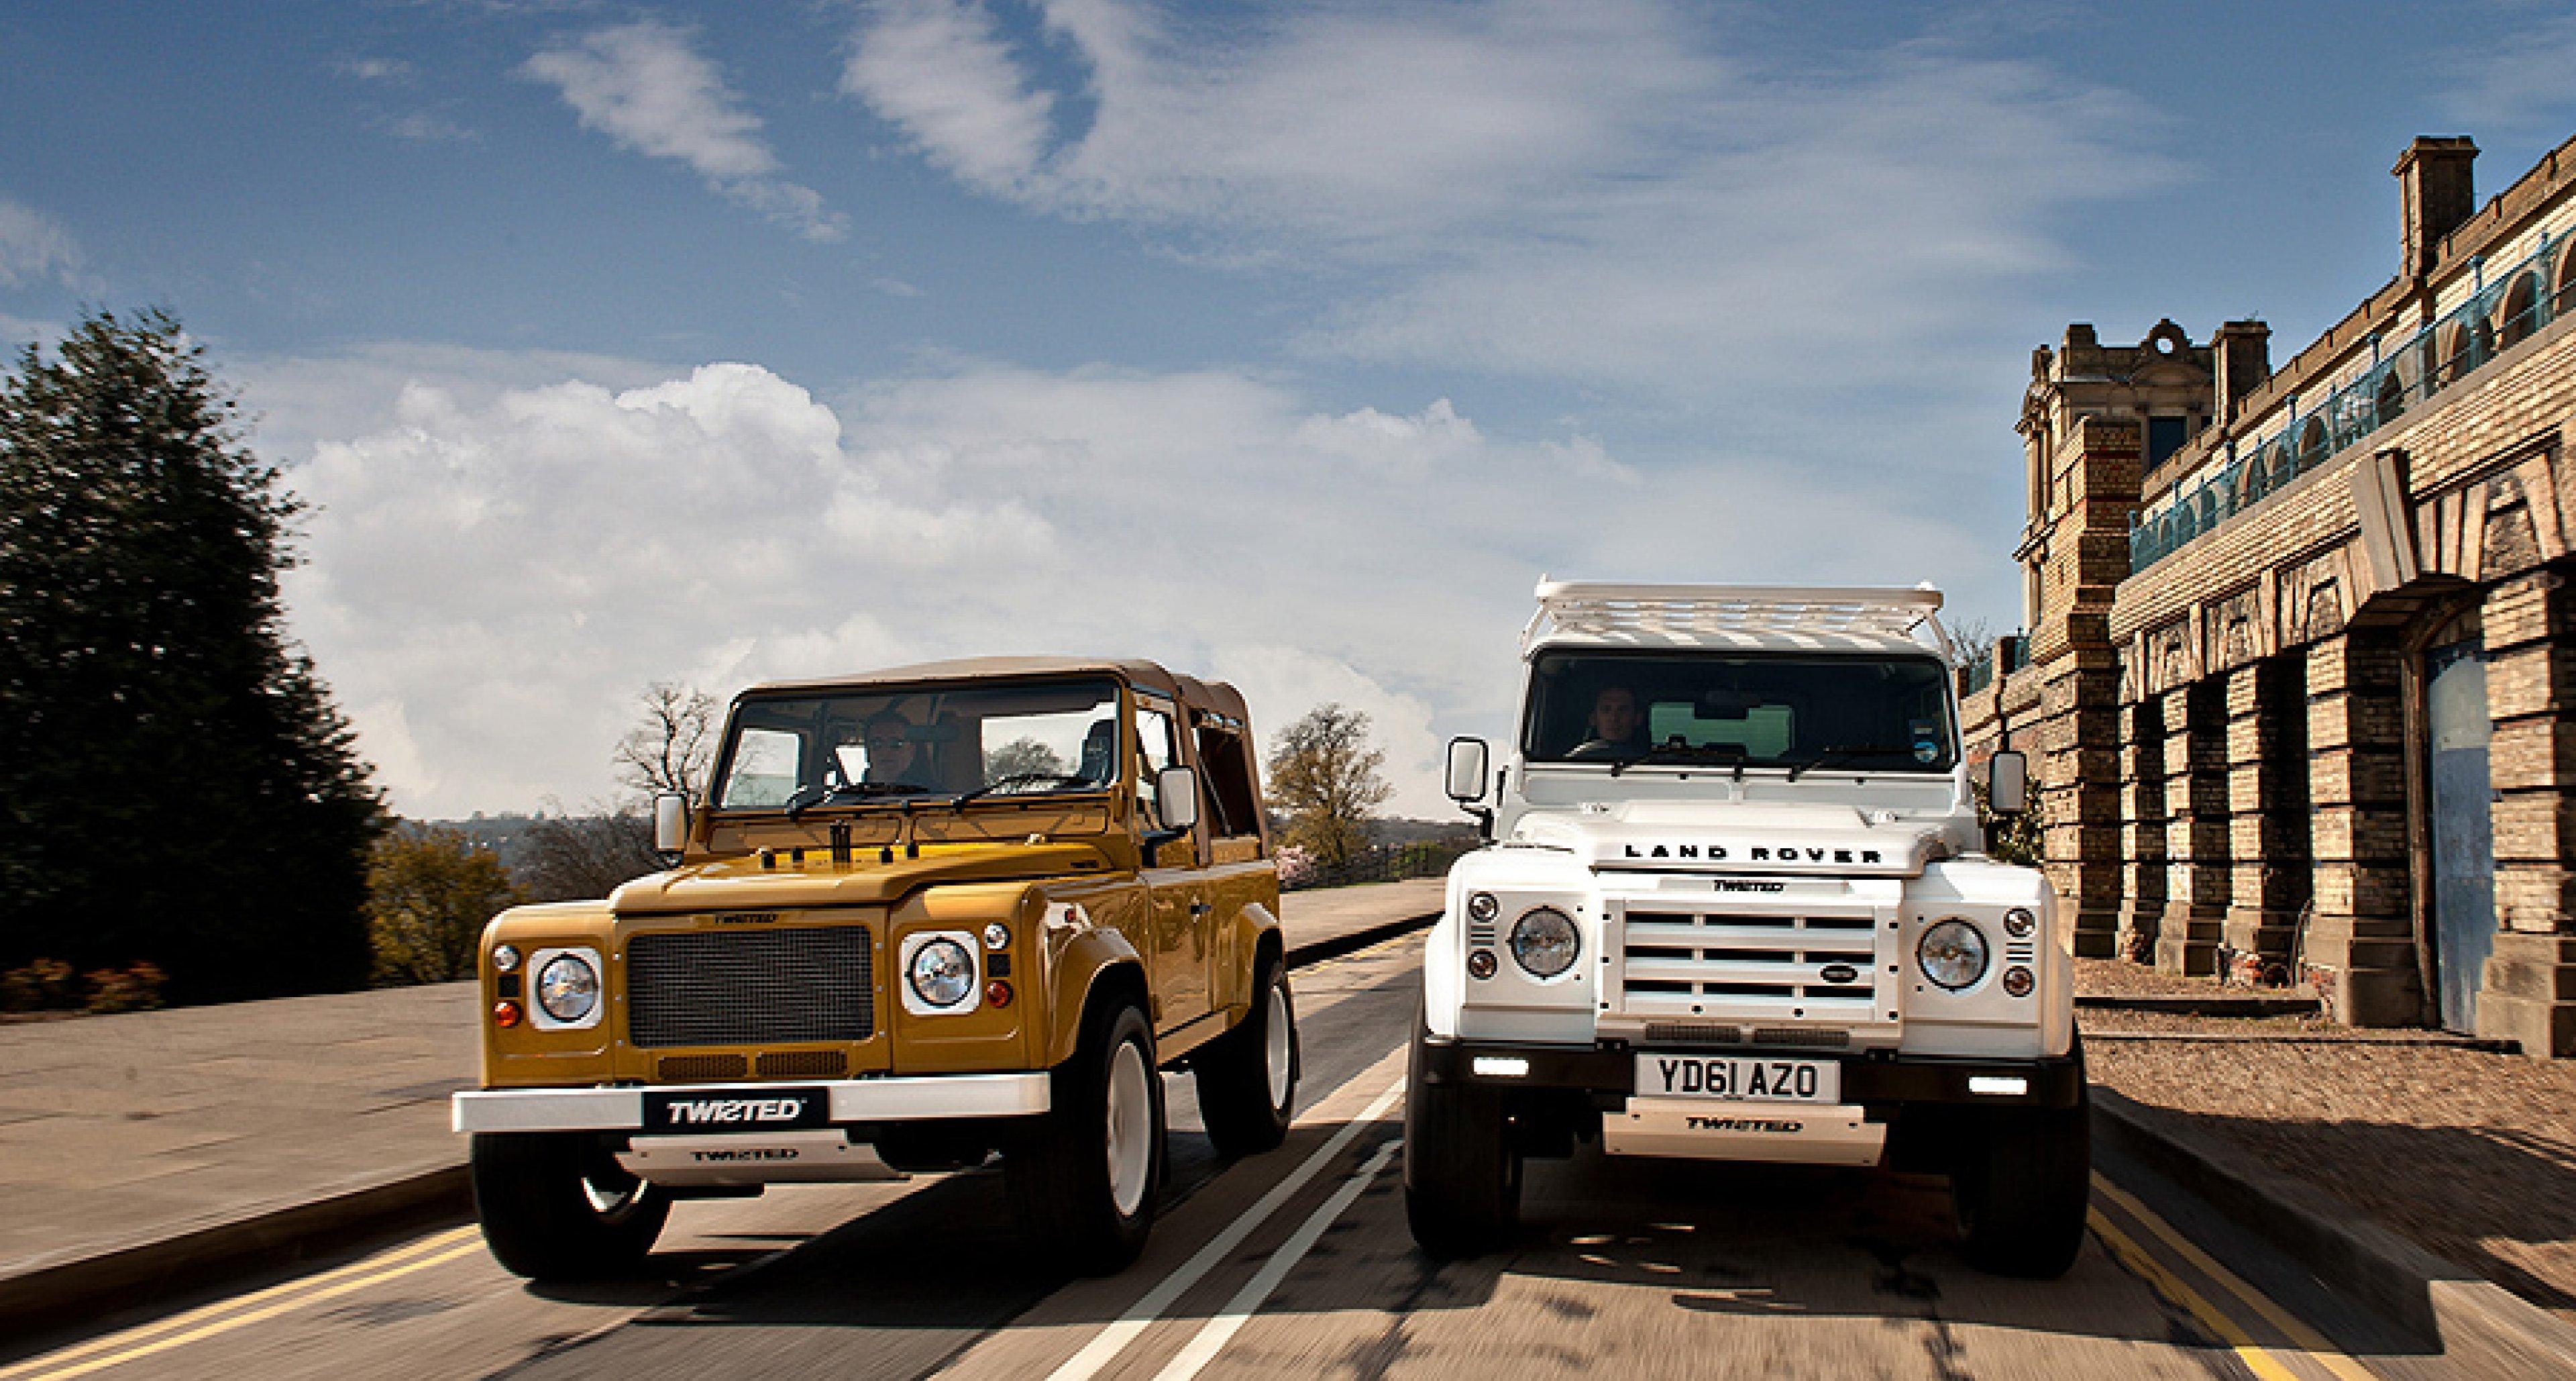 Land Rover Defender Twisted Editions: Urban Safari